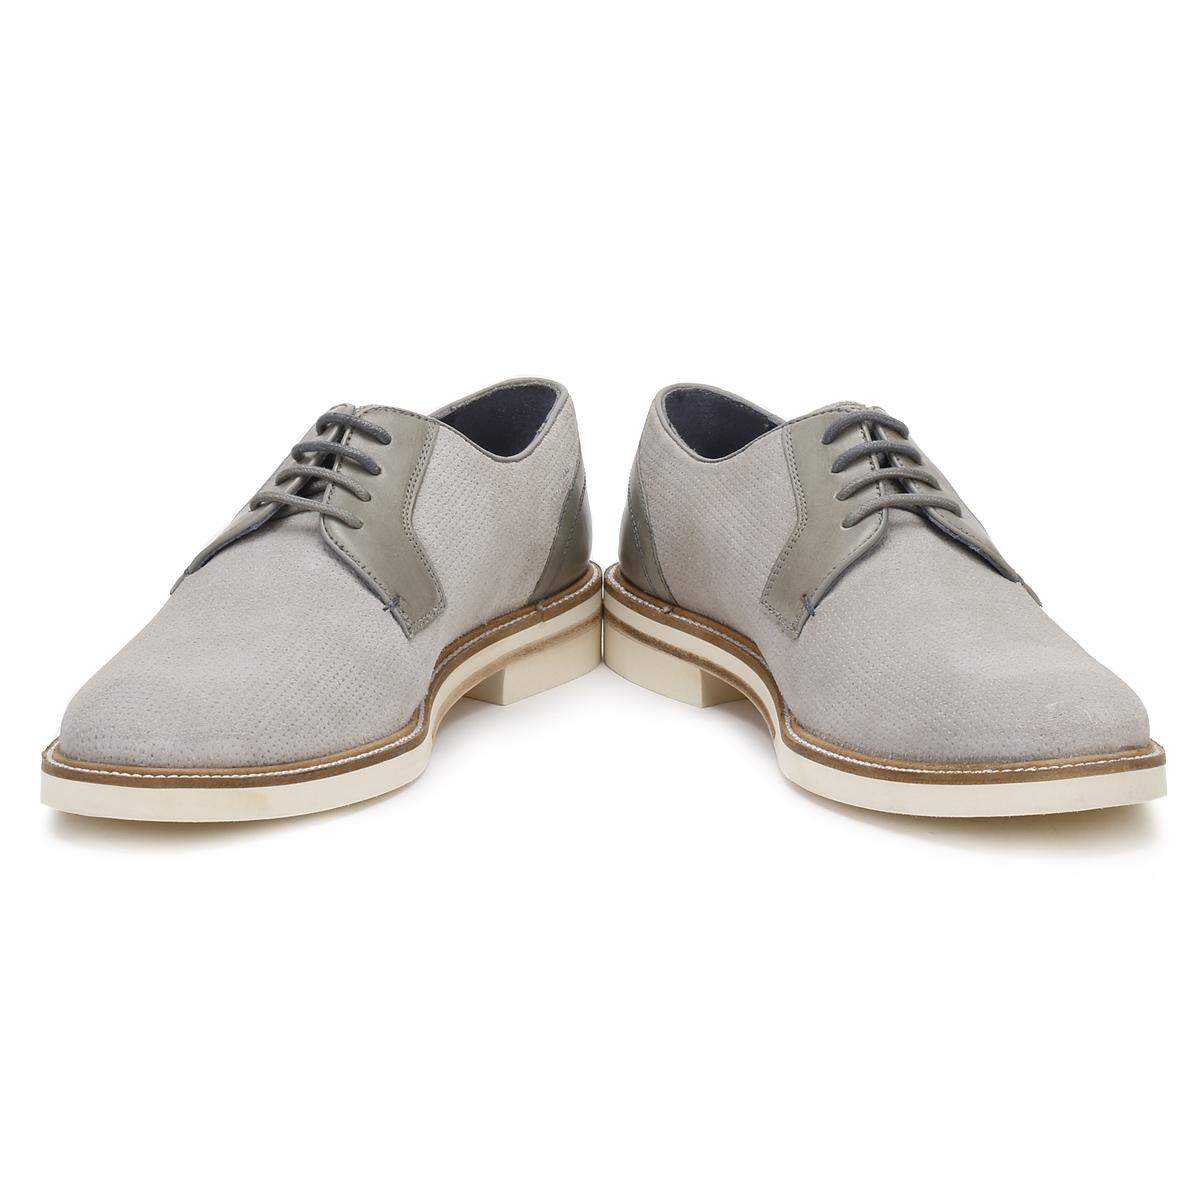 94ddd6a036fecf Ted Baker Mens Light Grey Siablo Derby Shoes